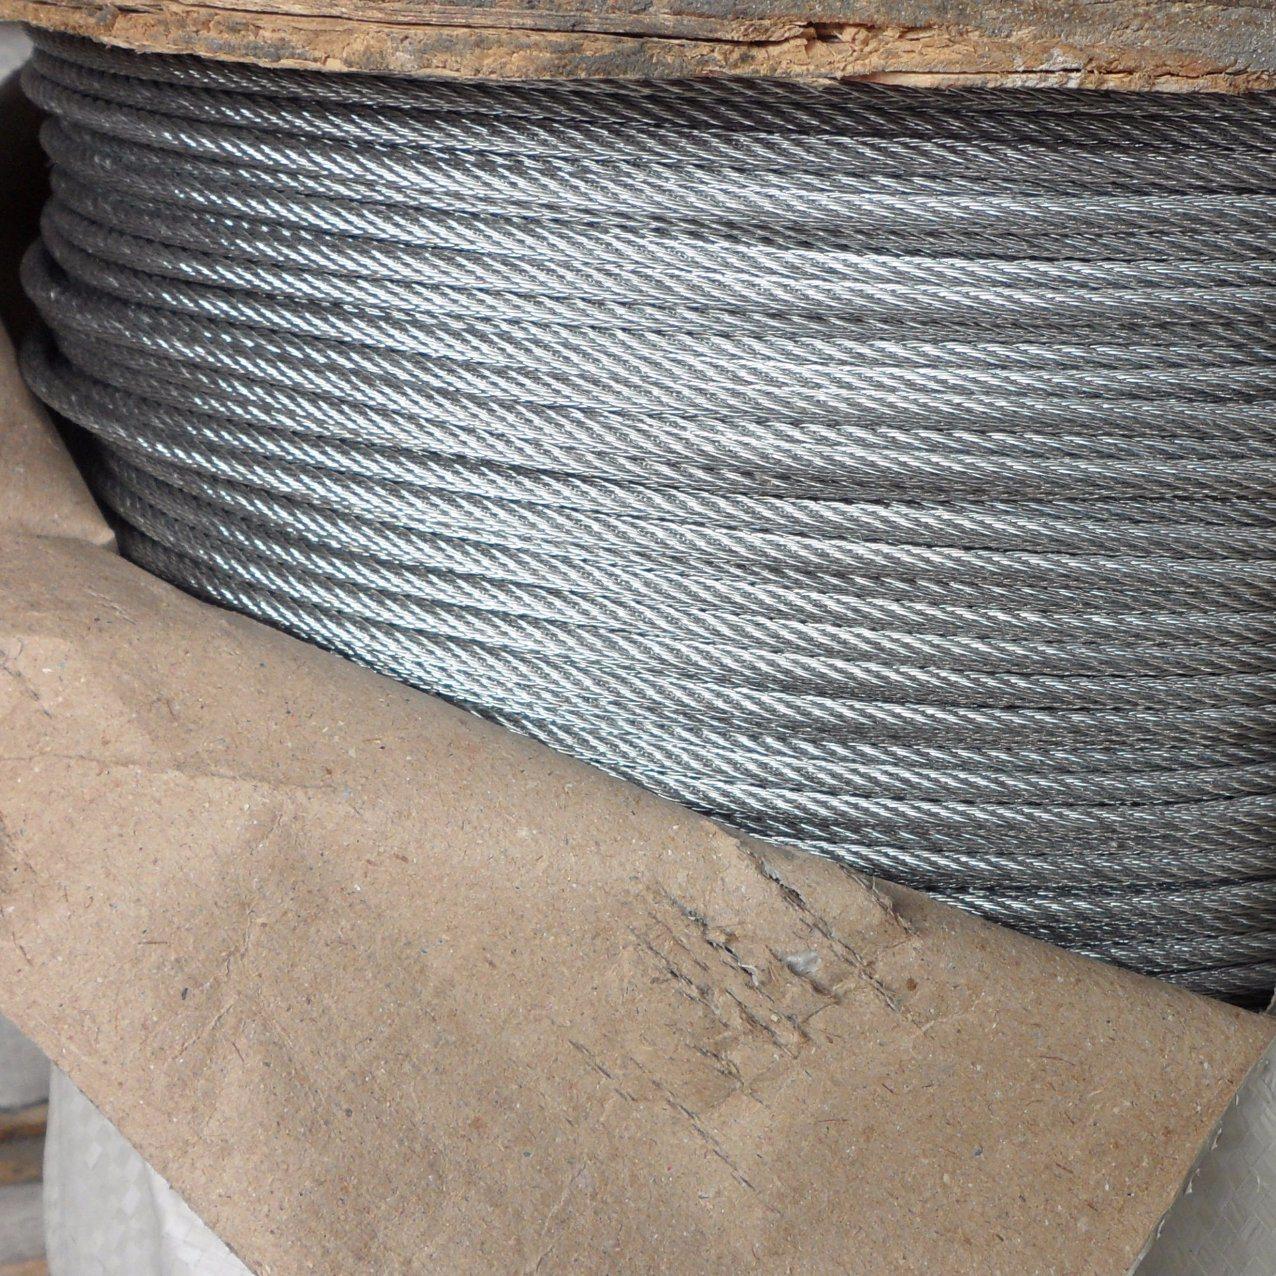 China 304 7*7 Stainless Steel Wire Rope Diameter 2mm - China ...